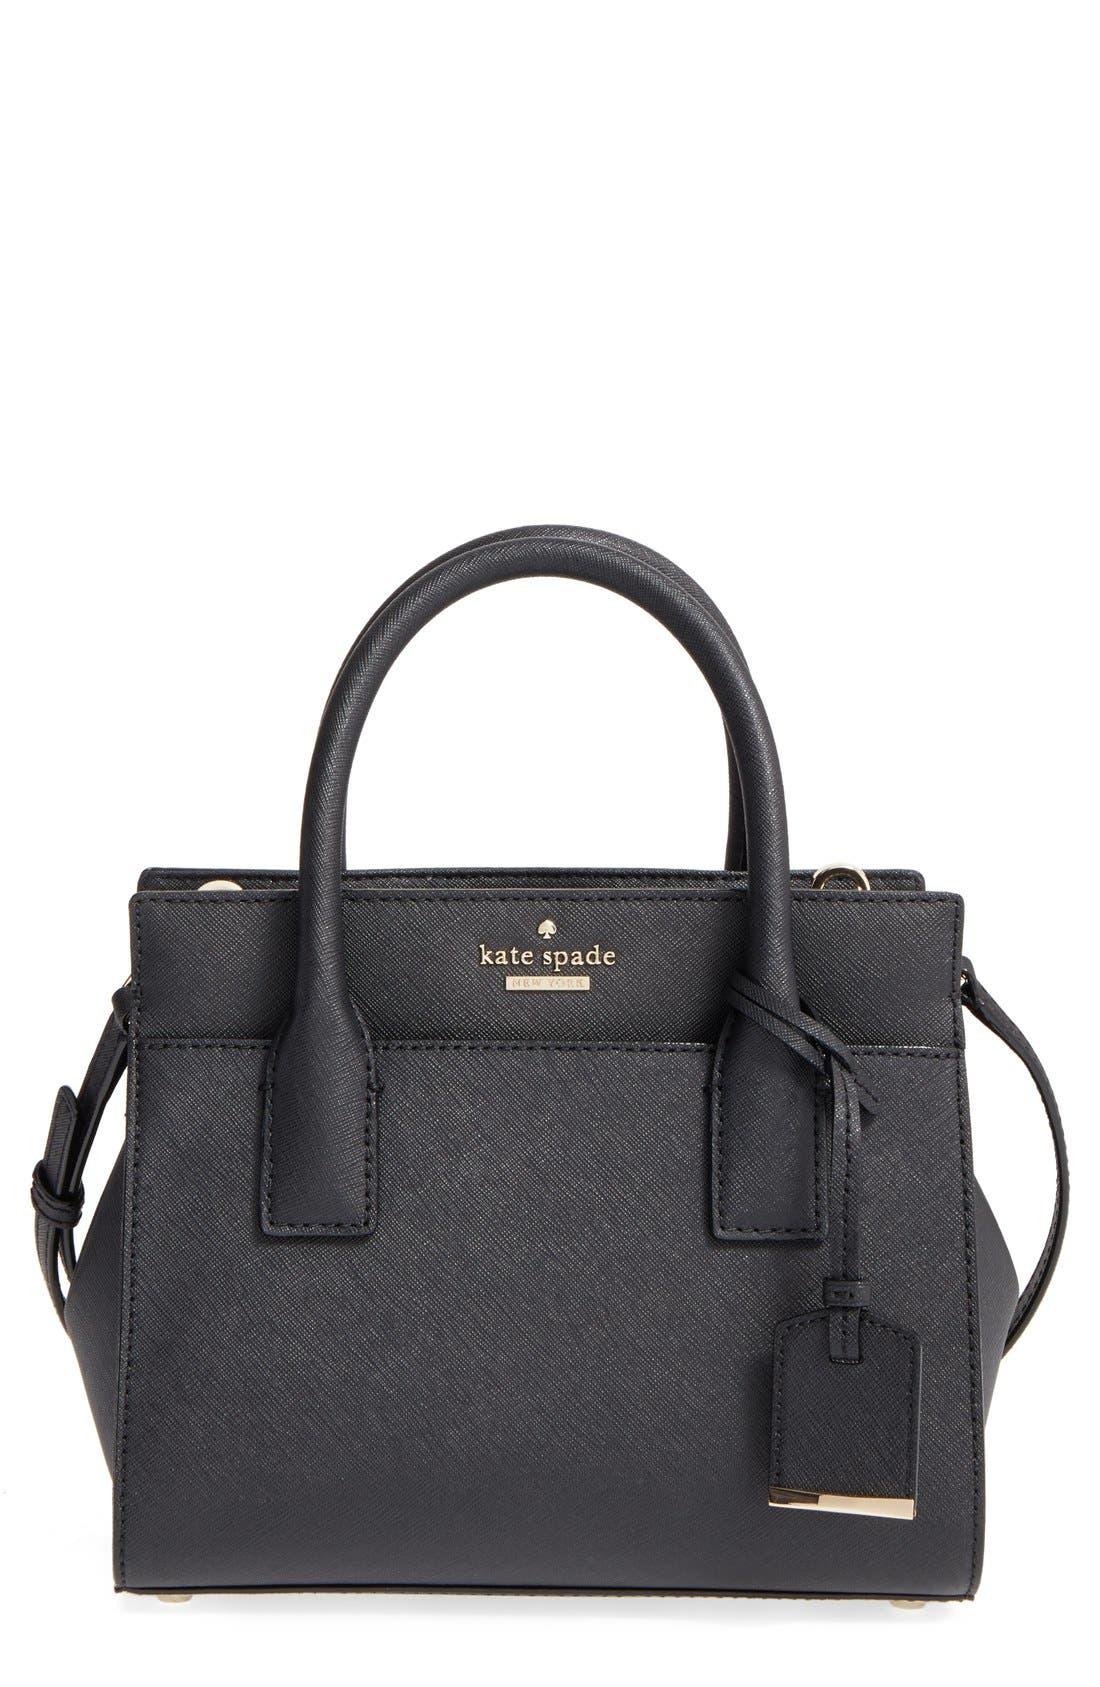 Alternate Image 1 Selected - kate spade new york 'cameron street - mini candace' leather satchel